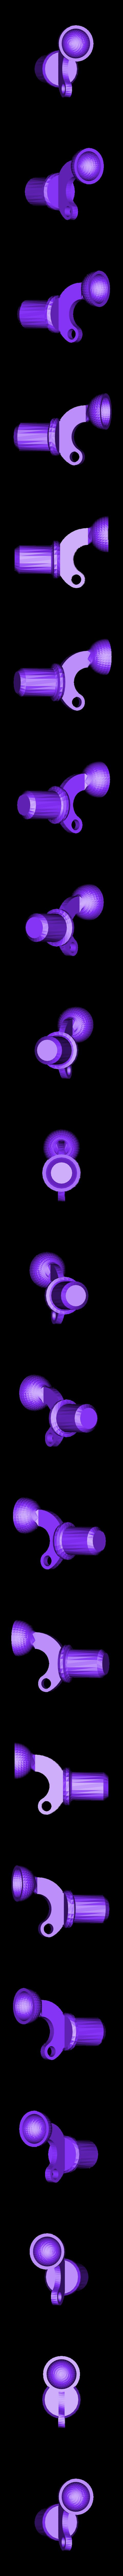 Axle-1.stl Download free STL file Fingerdigger • Design to 3D print, Zippityboomba